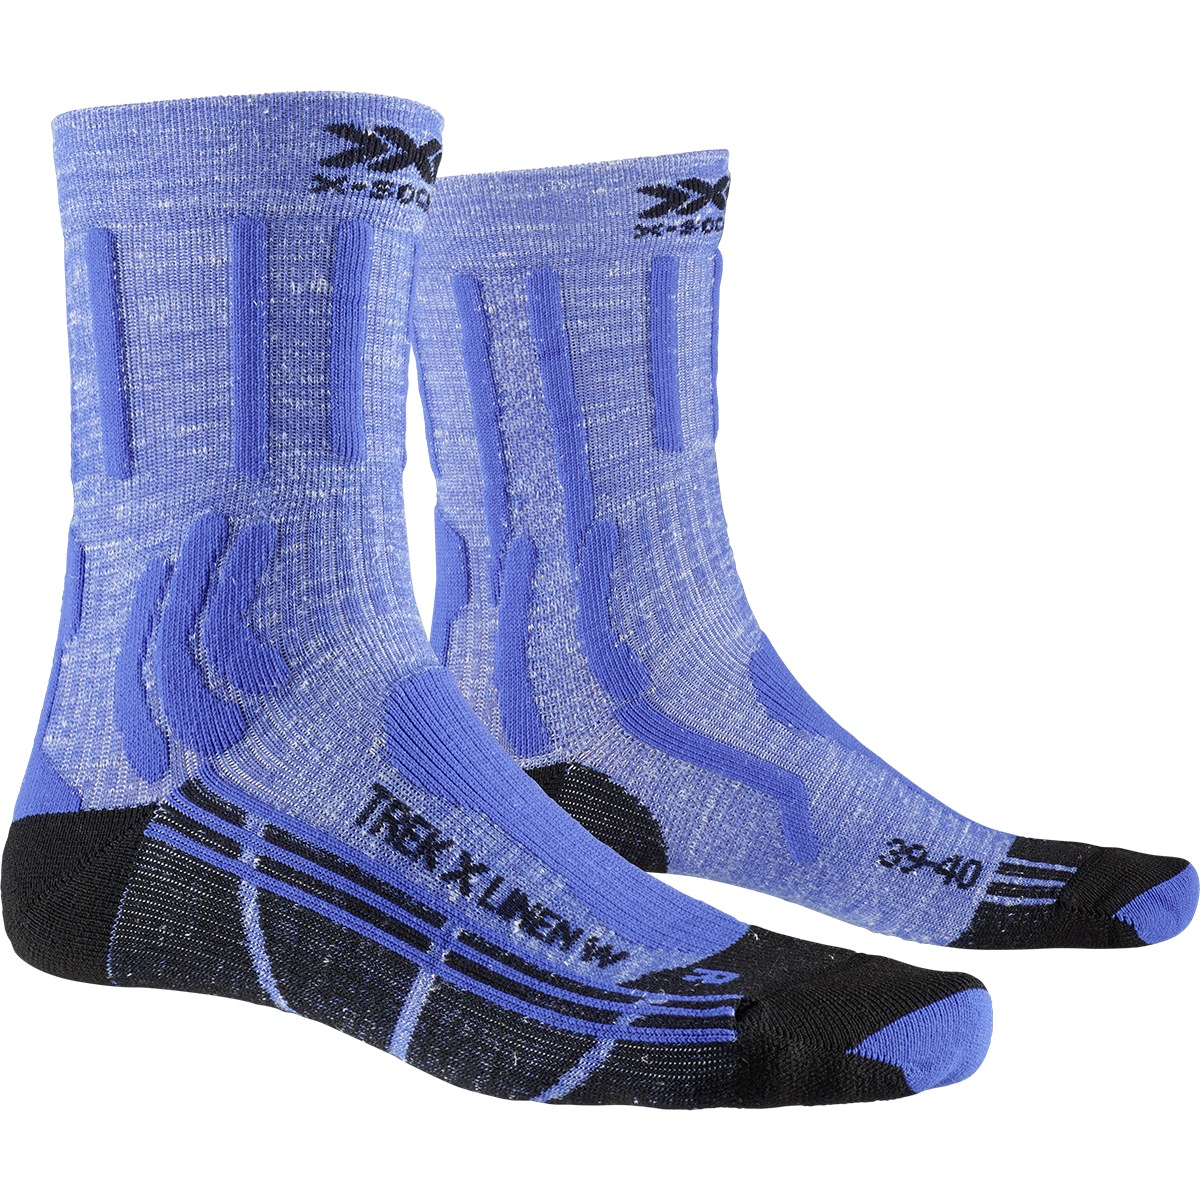 Bild von X-Socks Trek X Linen Damen Socken - lake blue/opal black